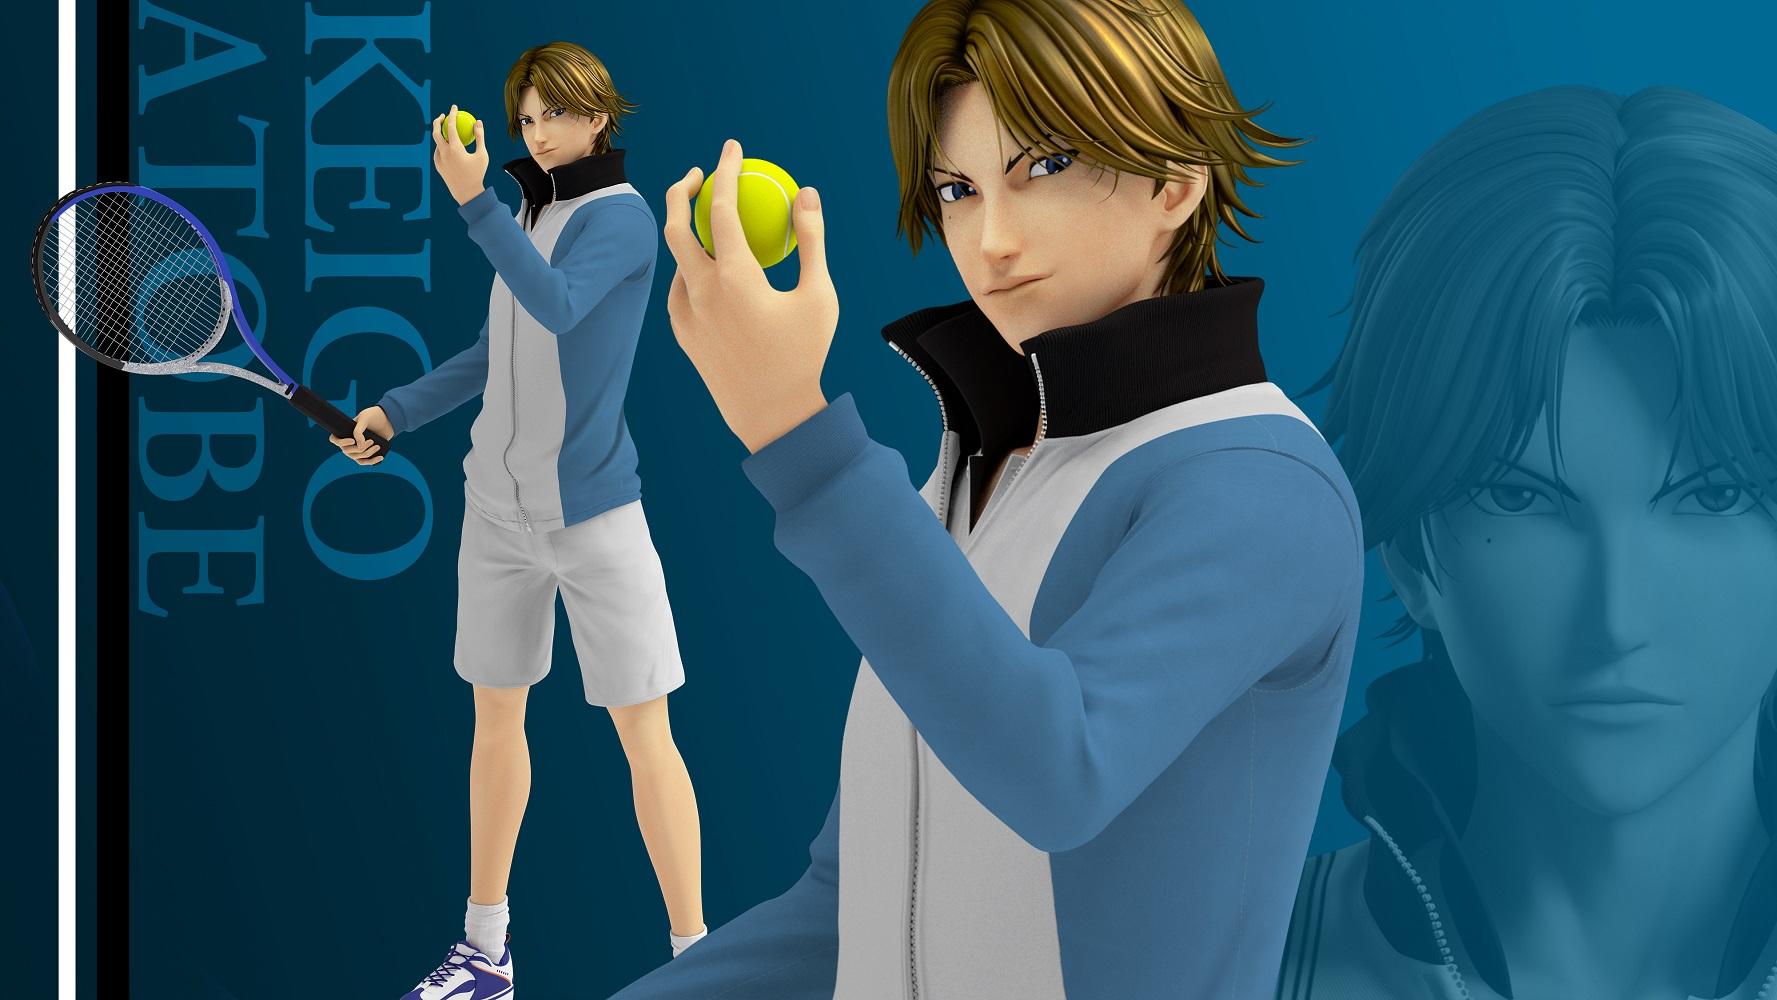 3DCG劇場版「リョーマ!新生劇場版テニスの王子様」リョーマ・手塚・跡部らの3DCG画像が解禁!キャストコメントも到着